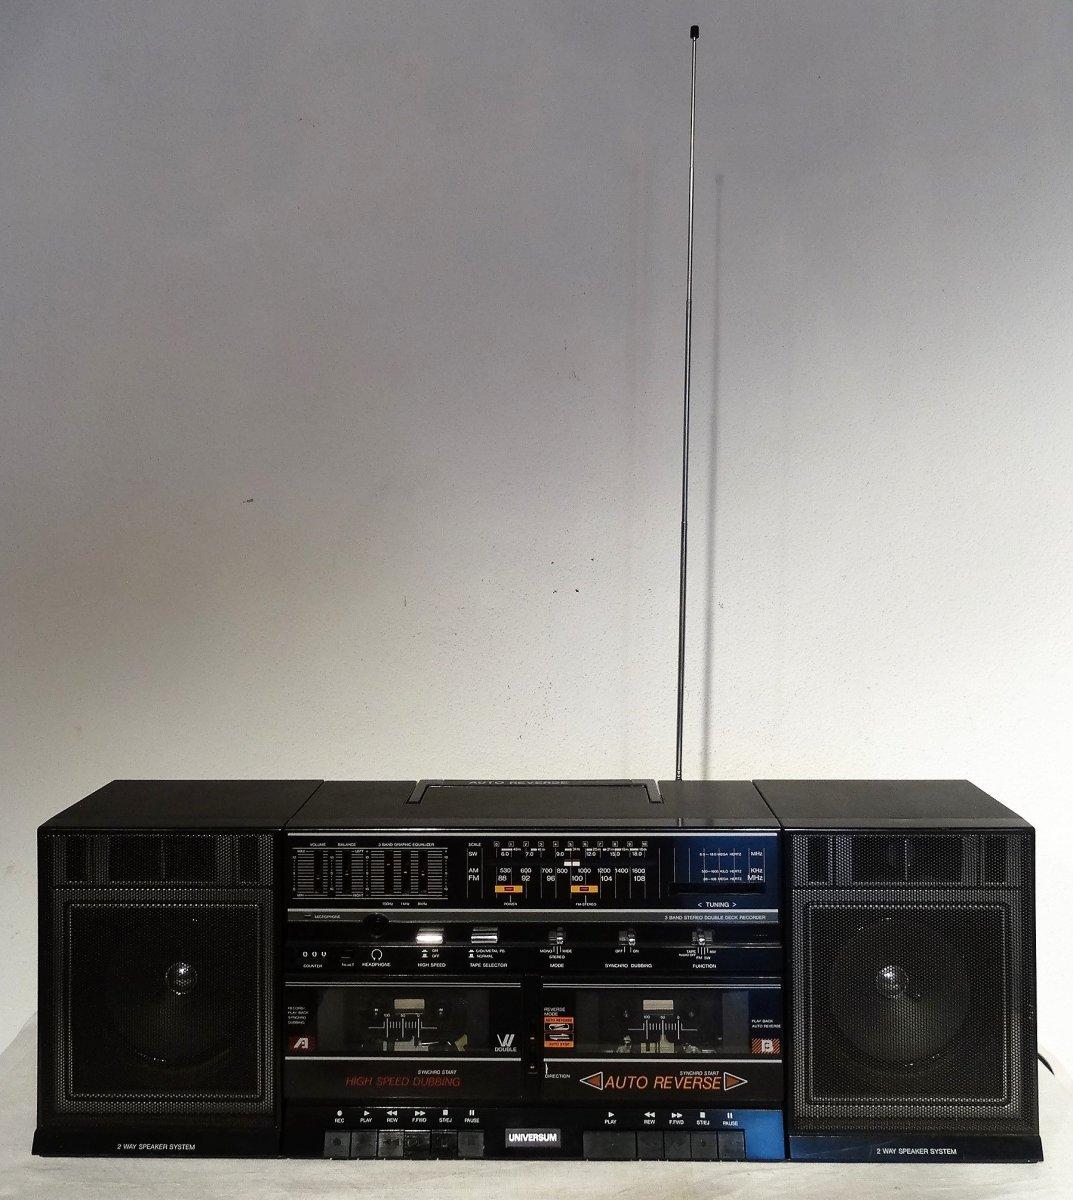 double stereo kassettenradio radio universum ctr 4673. Black Bedroom Furniture Sets. Home Design Ideas